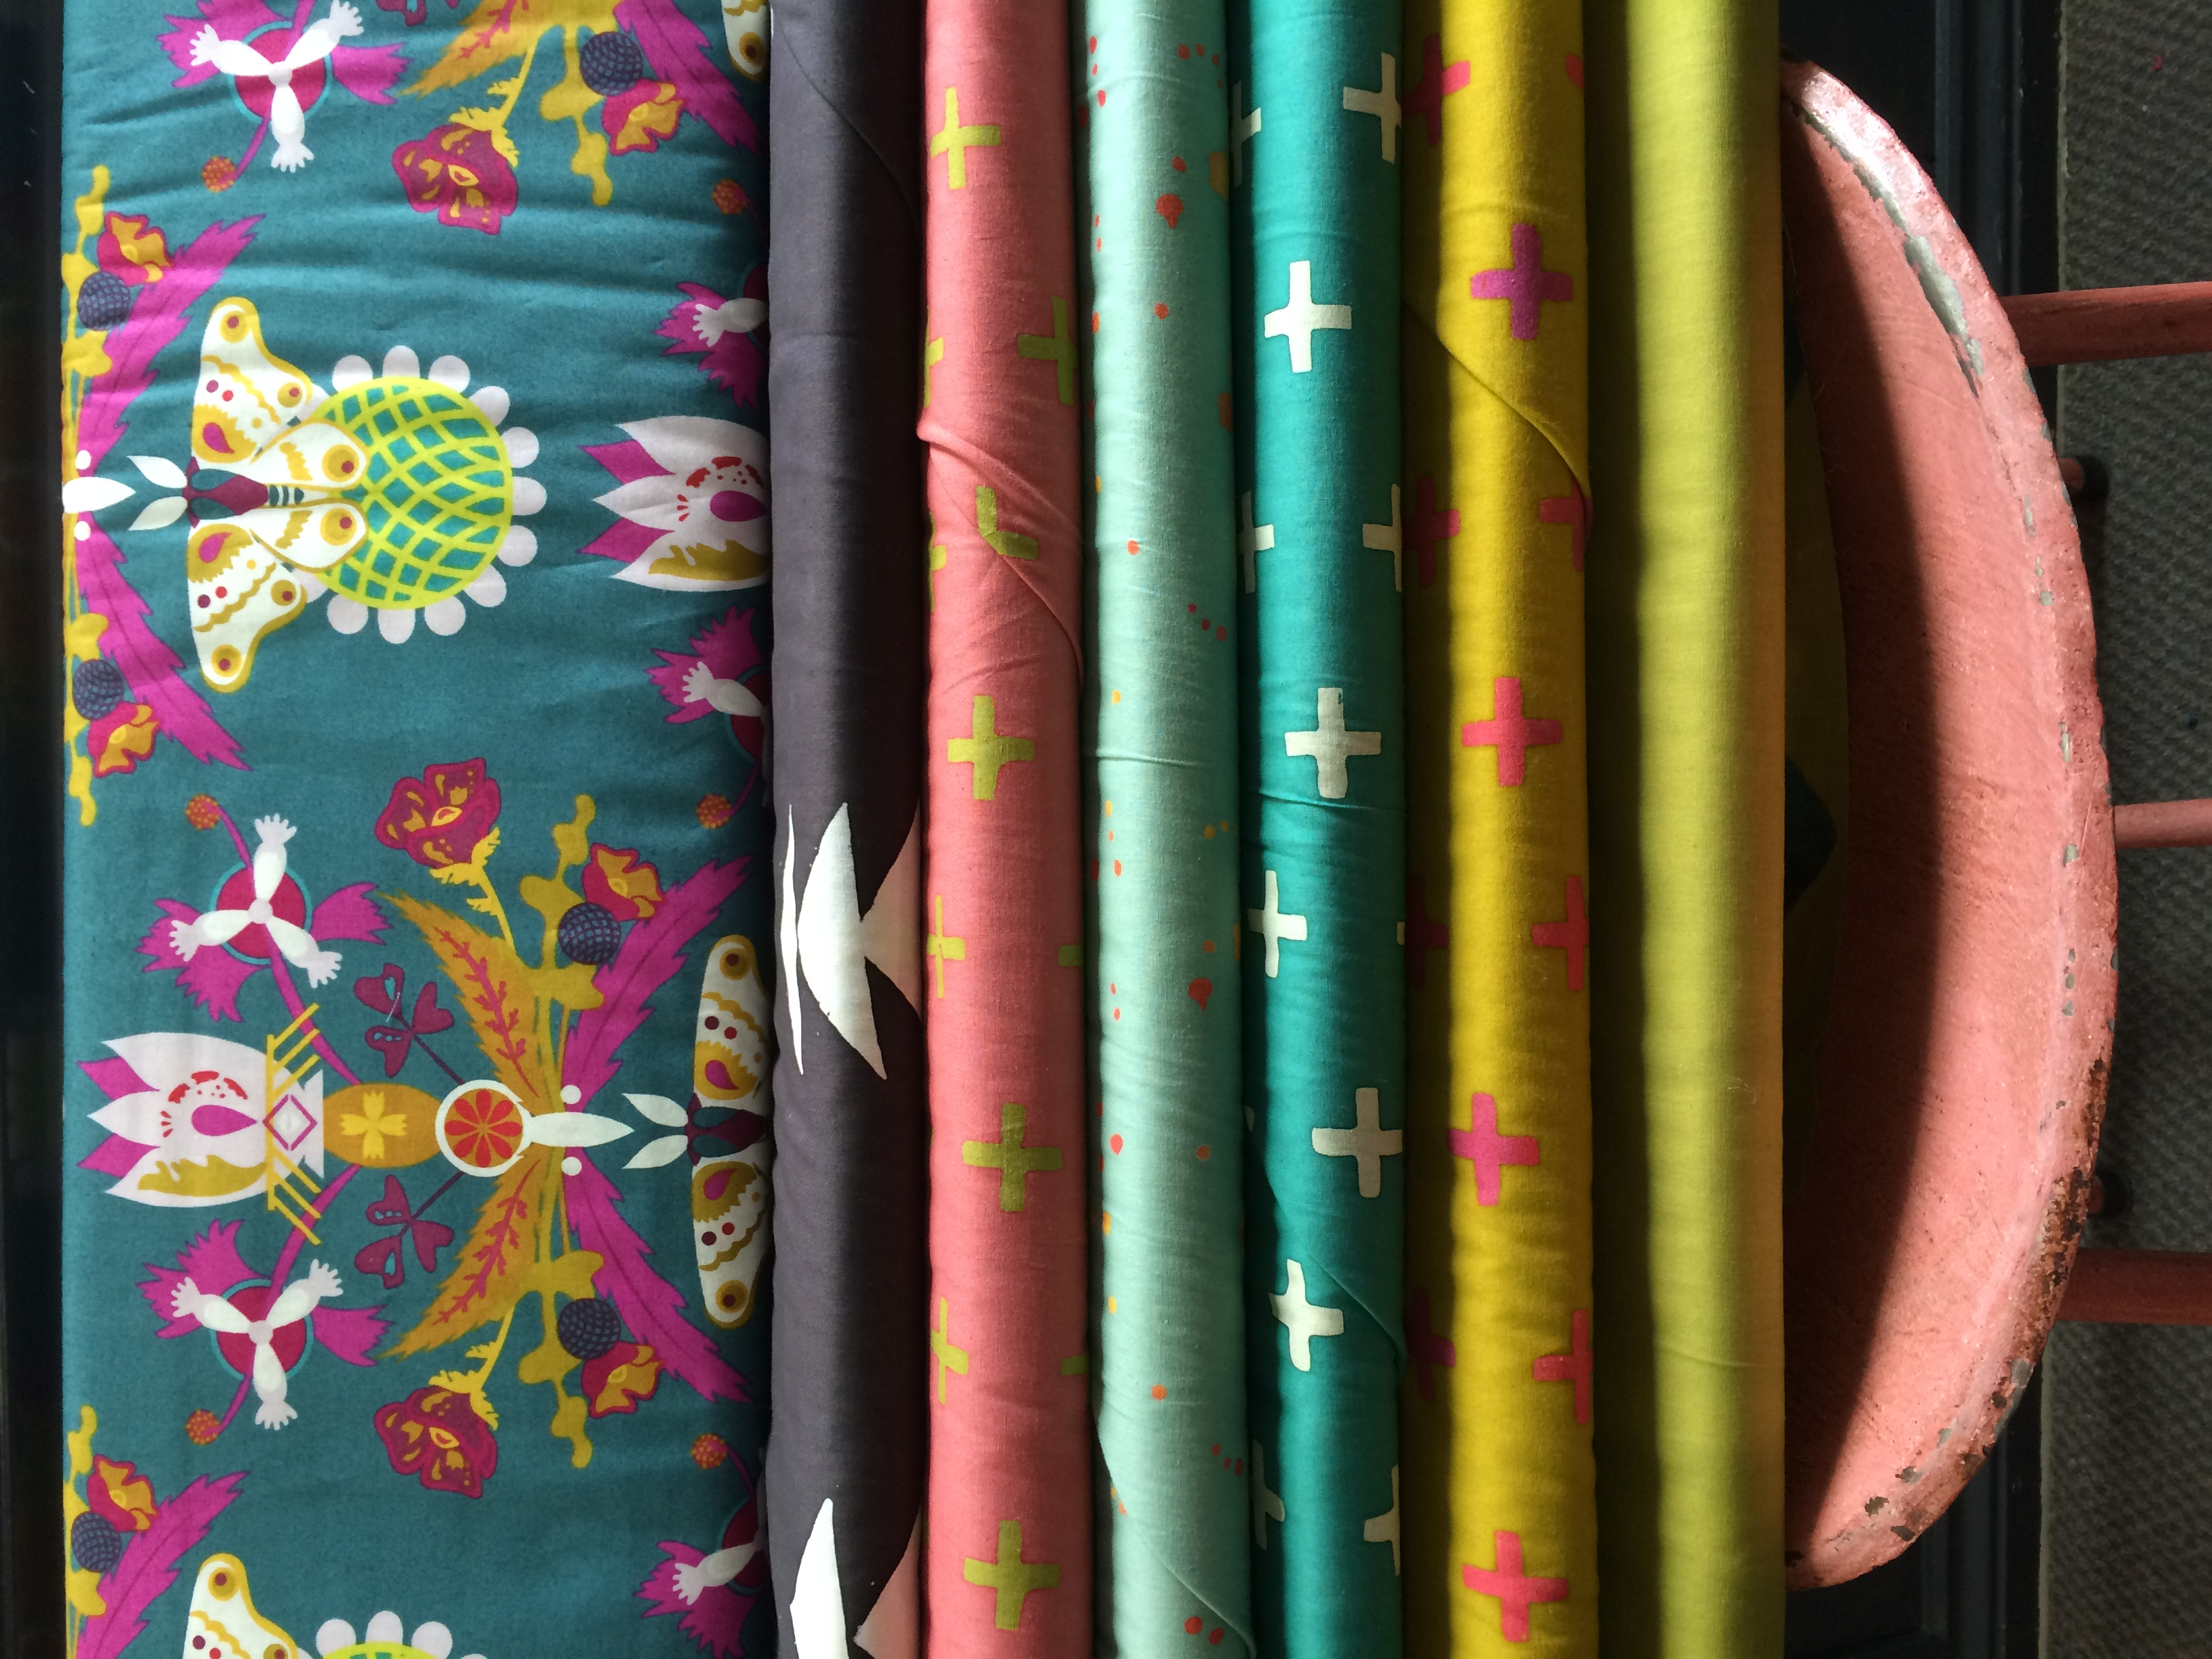 Previous Alison Glass fabrics